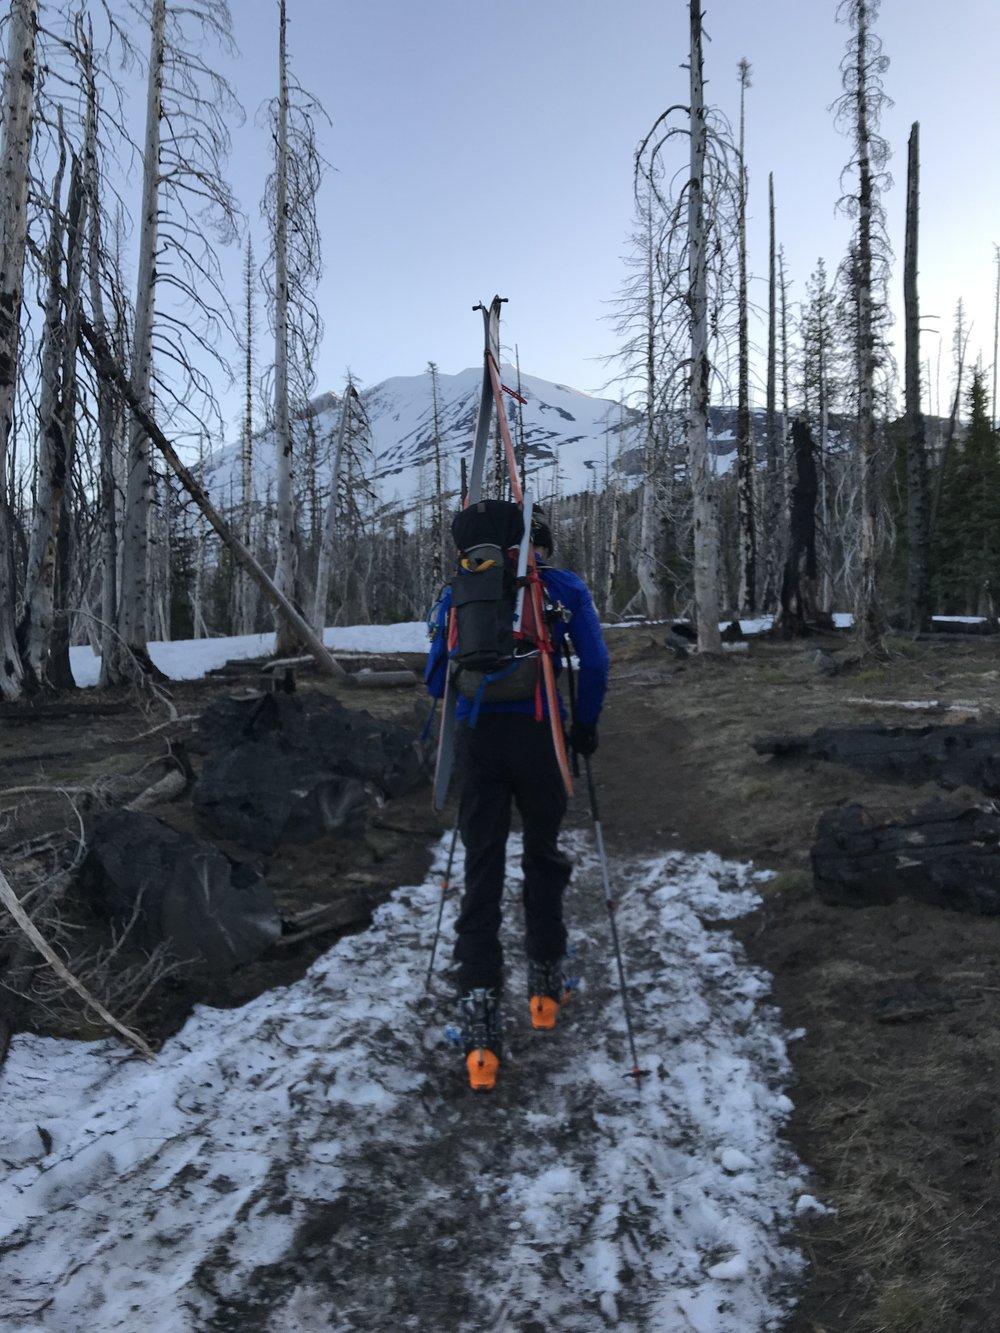 7k feet to go - South Climb Trail #180, Washington